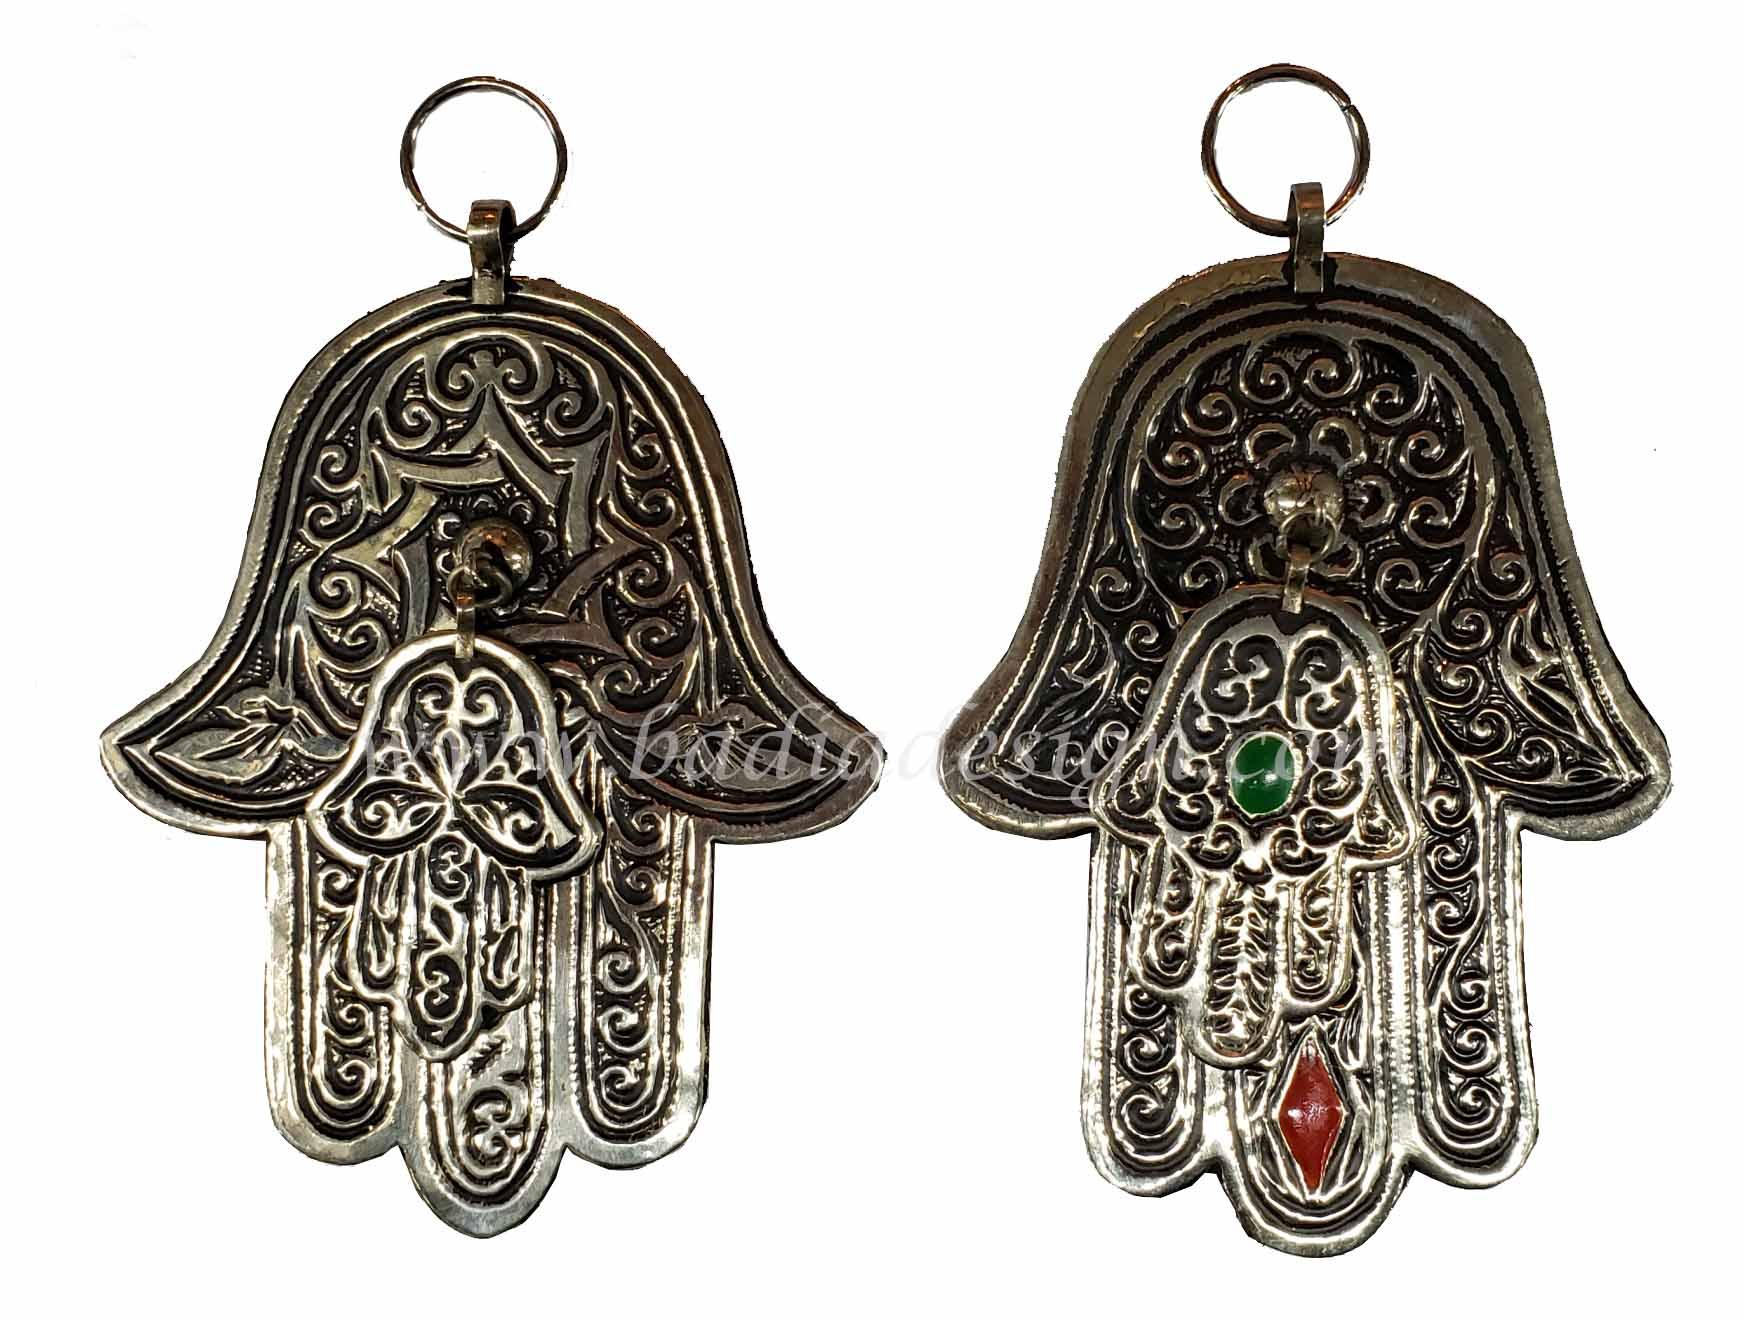 khamsa-hand-of-fatima-pendant-hd188.jpg